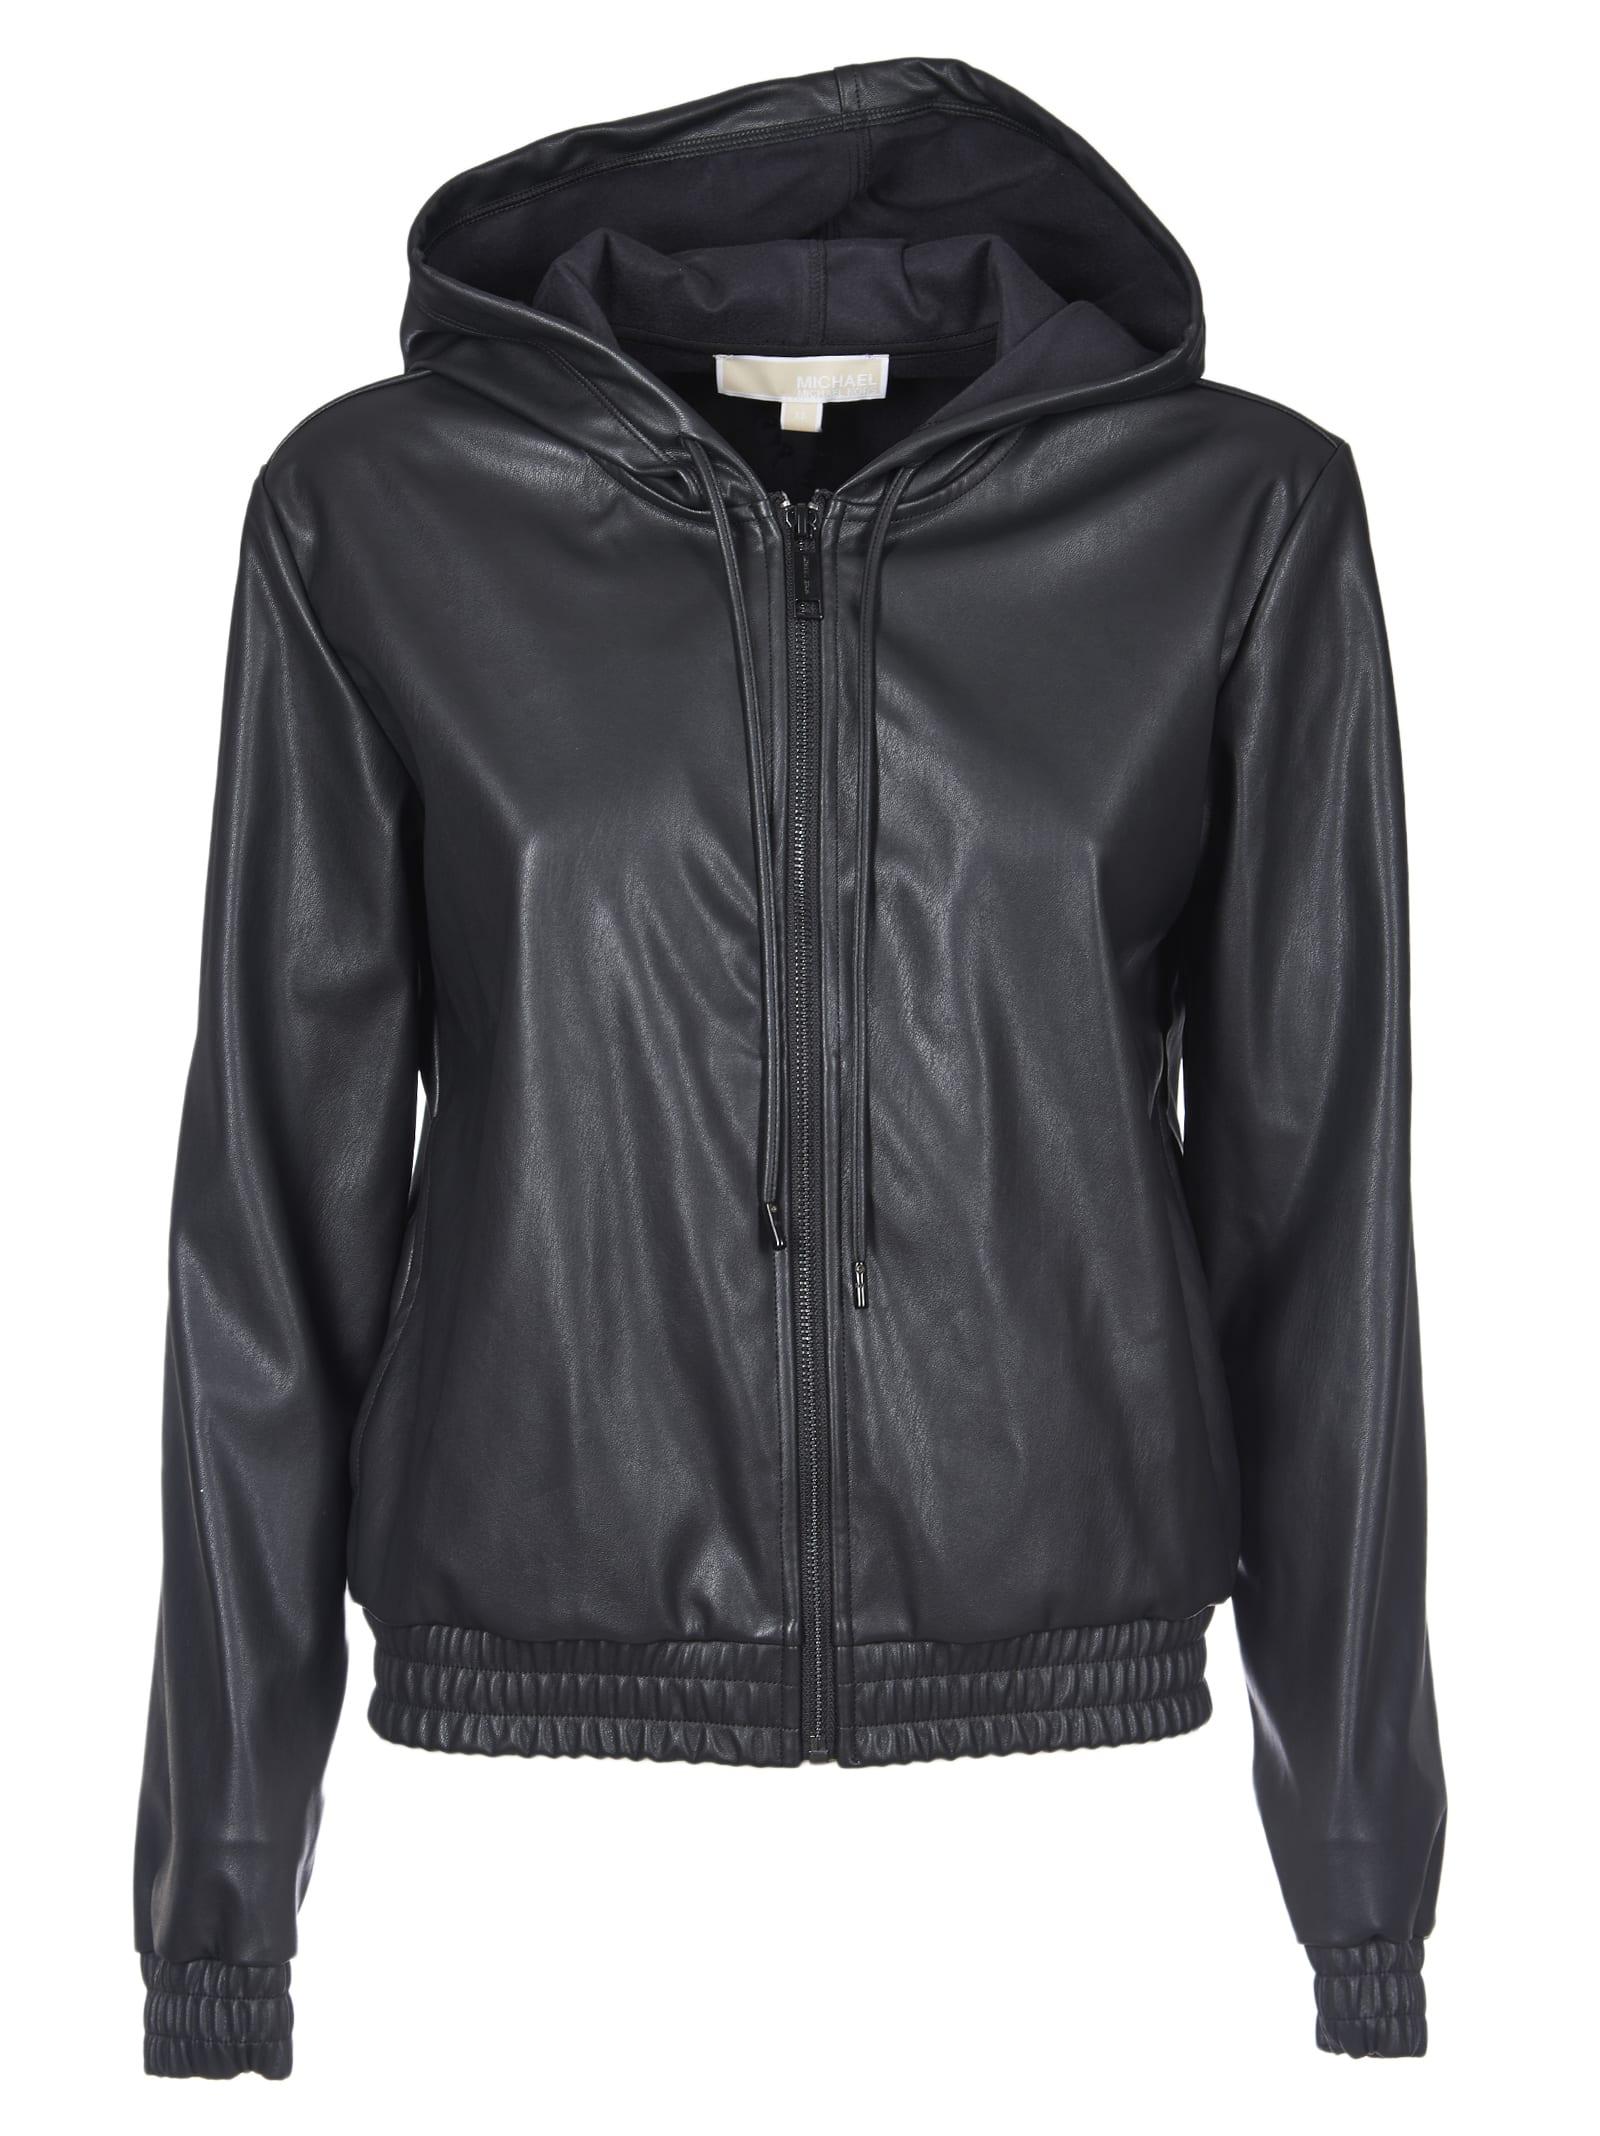 Michael Kors Eco-leather Hooded Jacket In Black